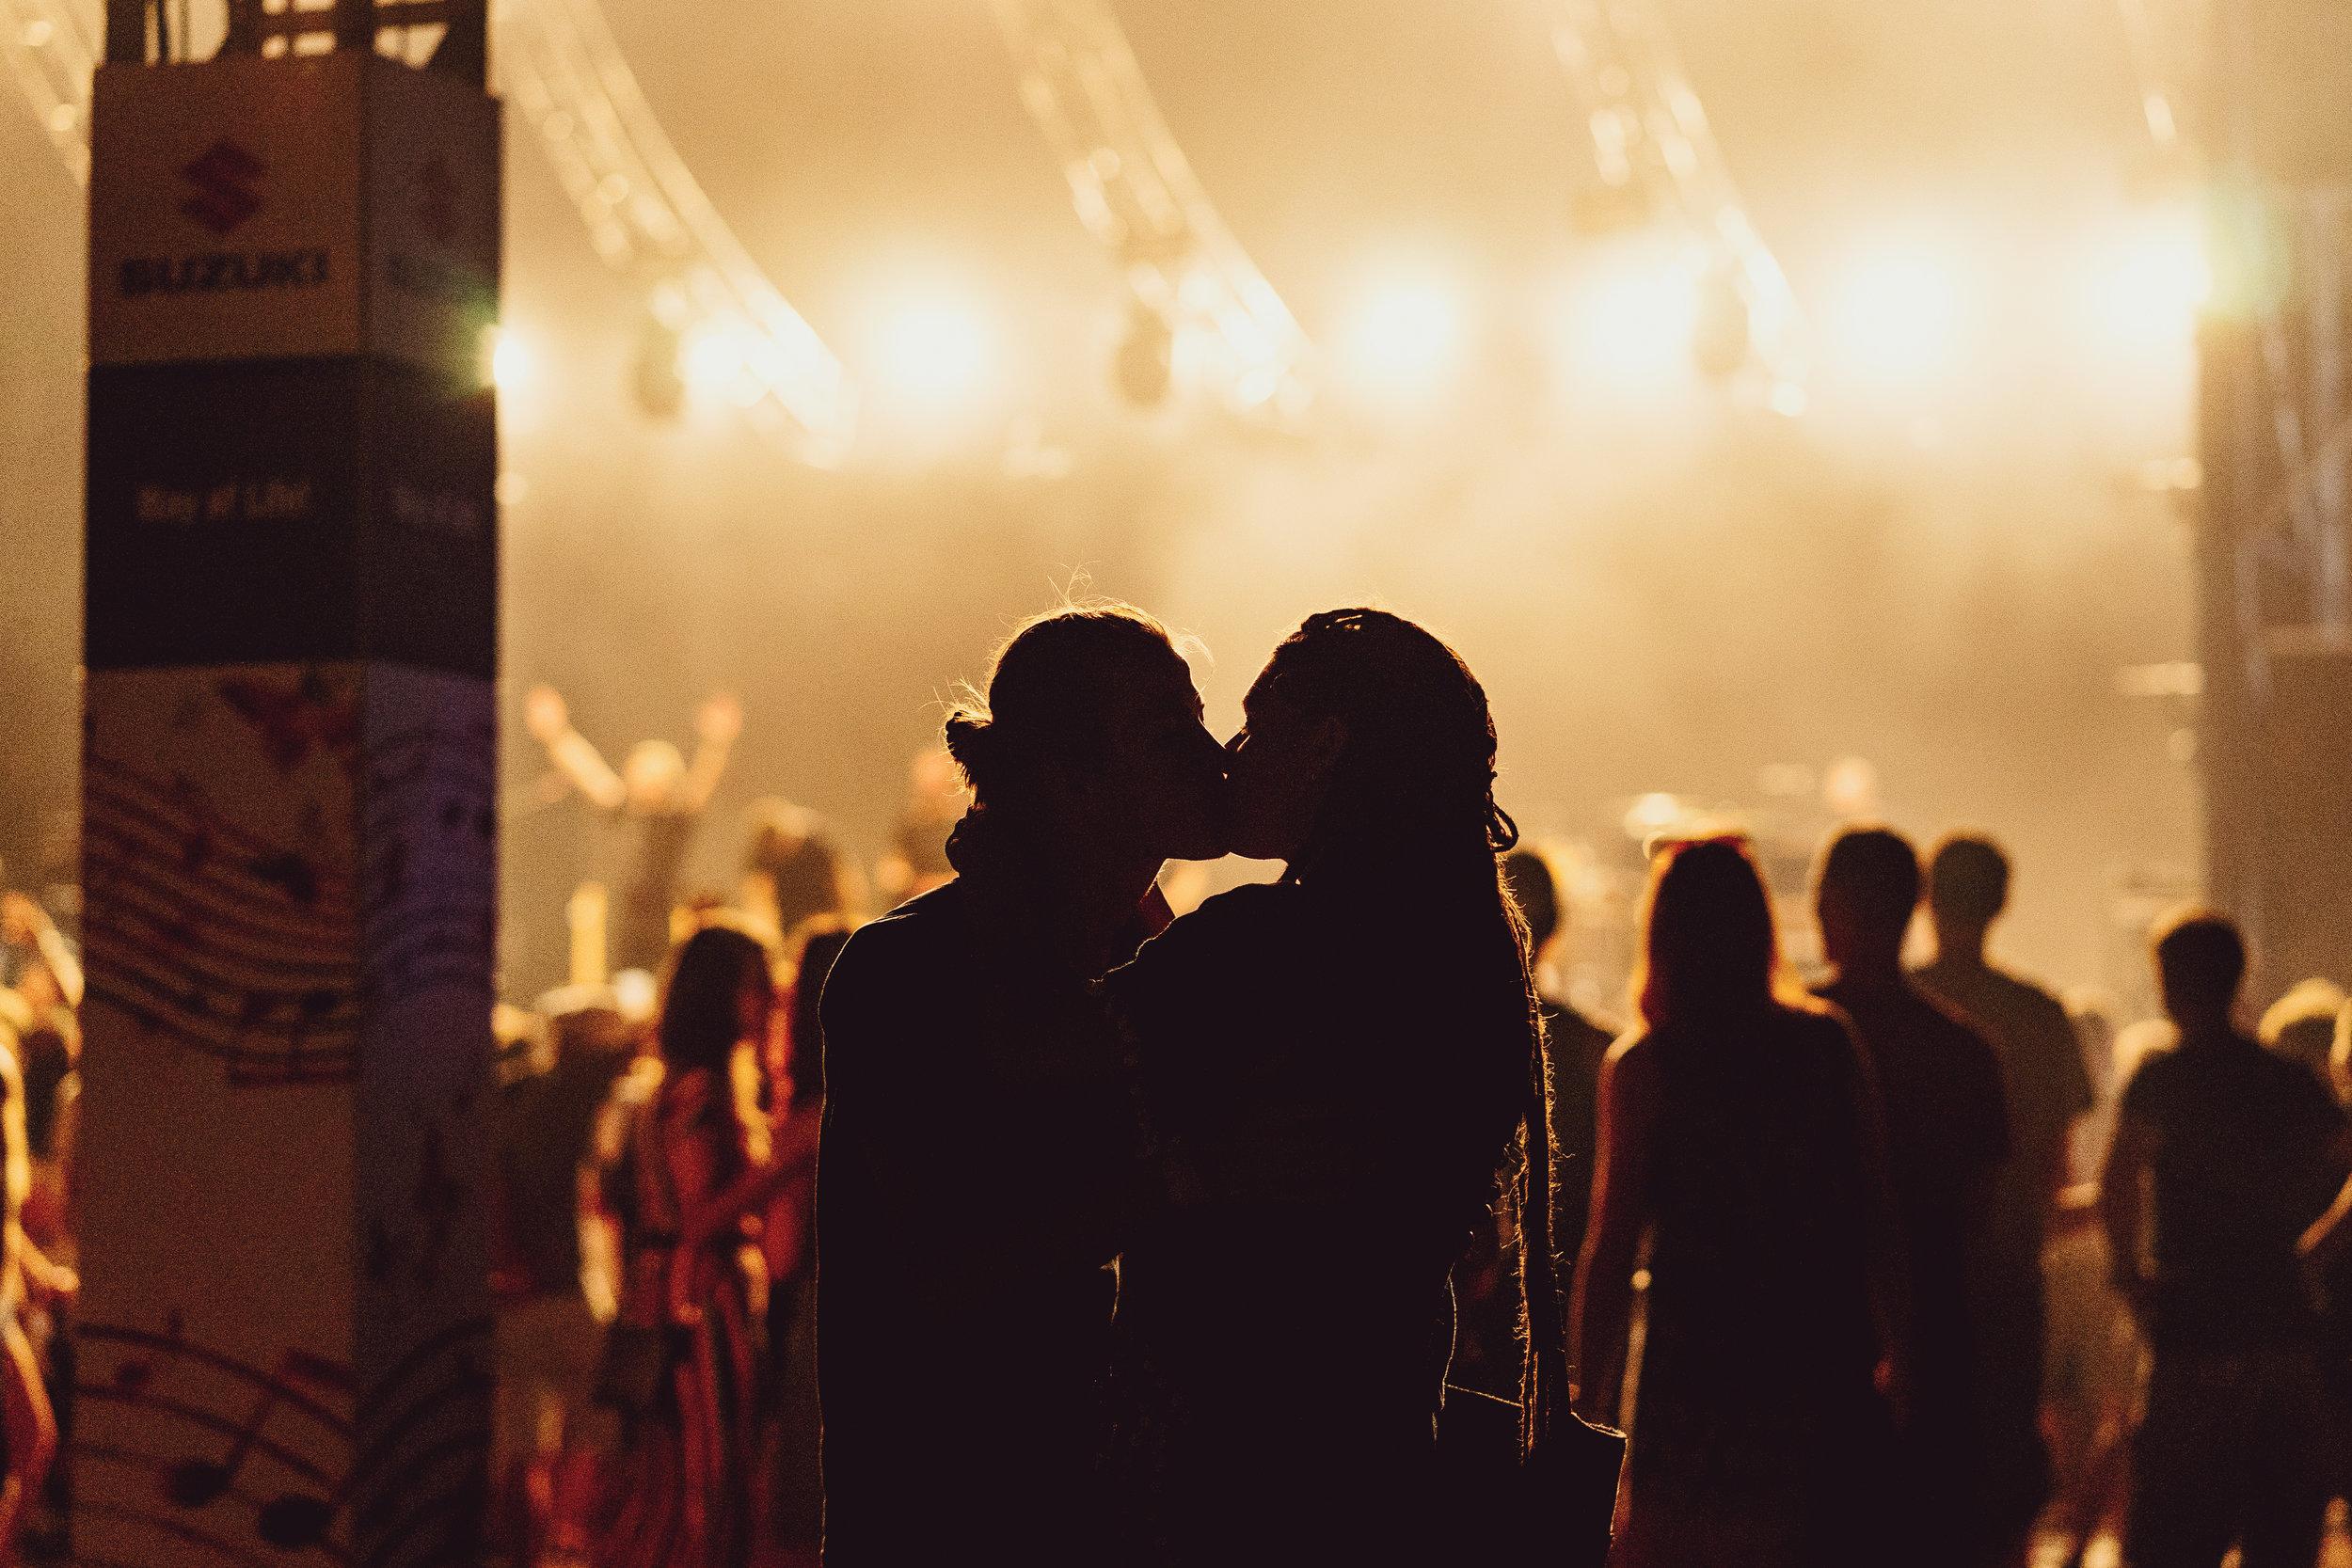 Shall We Kiss? - © 2014Genre: Acoustic Guitar/PianoTheme: Love